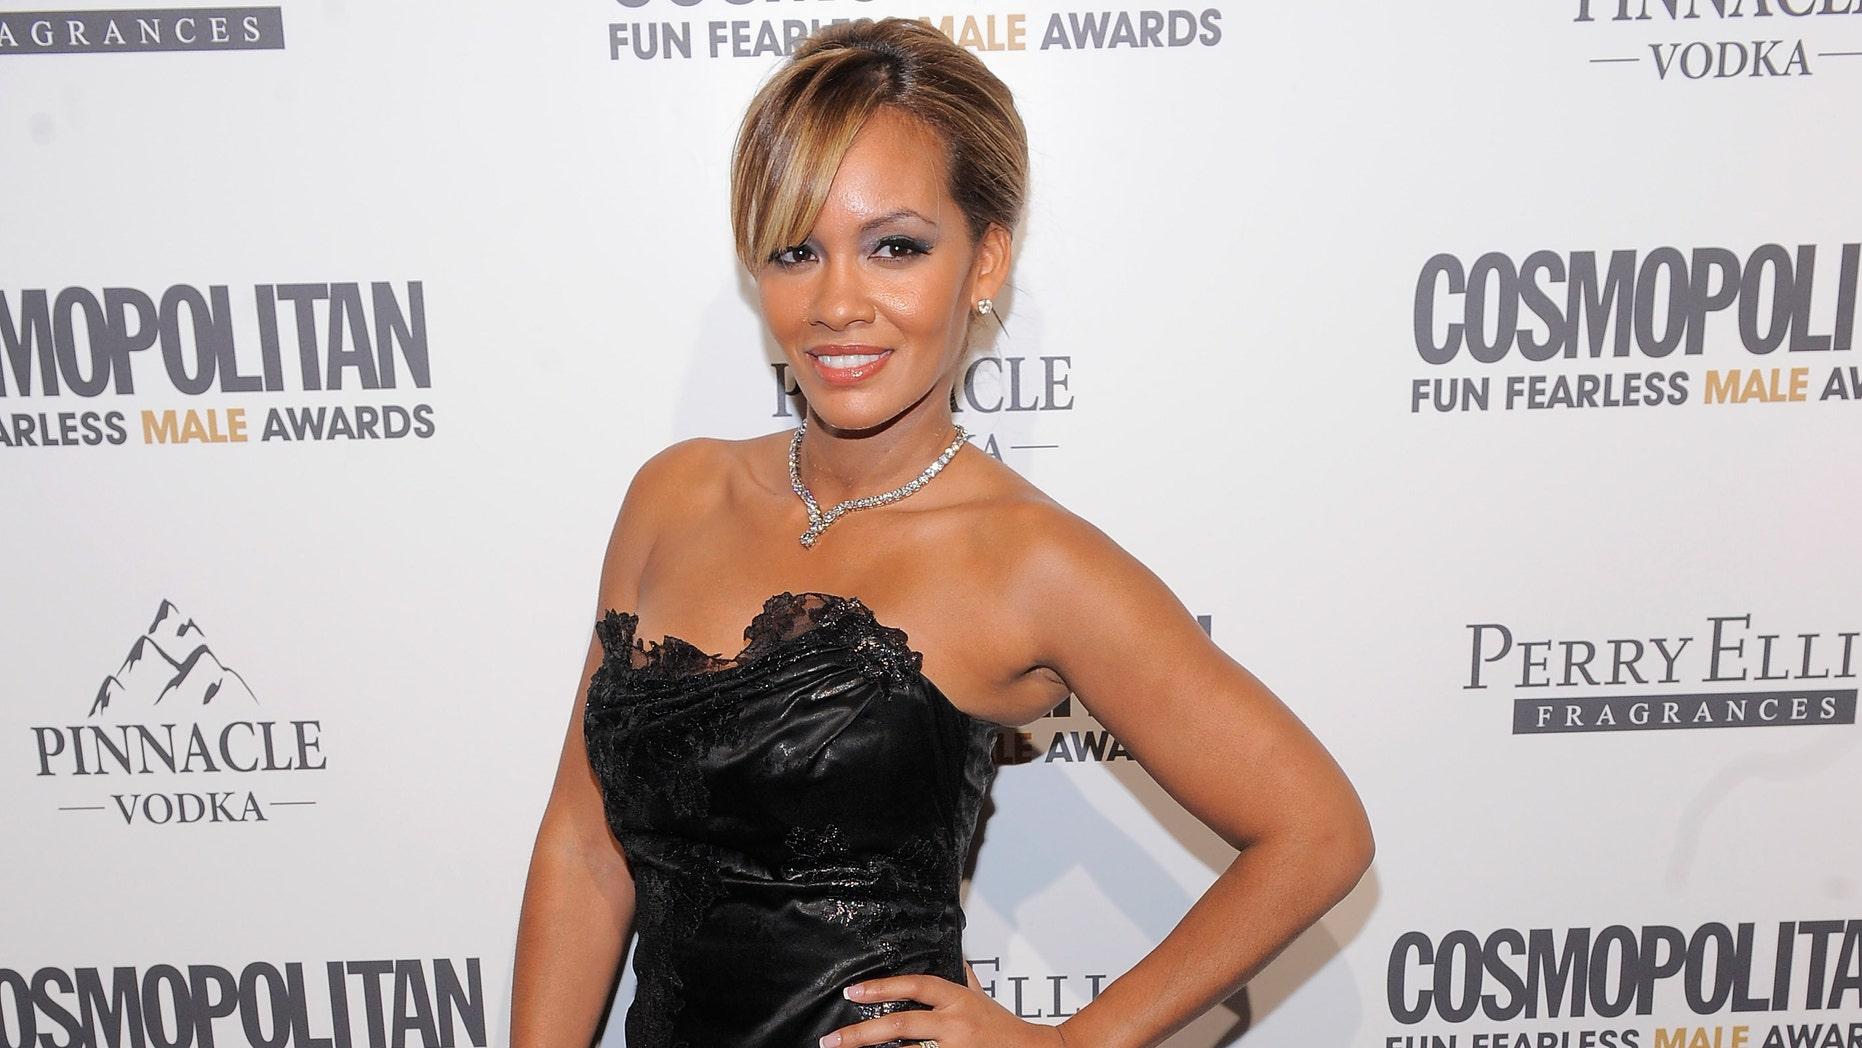 Evelyn Lozada in a 2011 file photo.